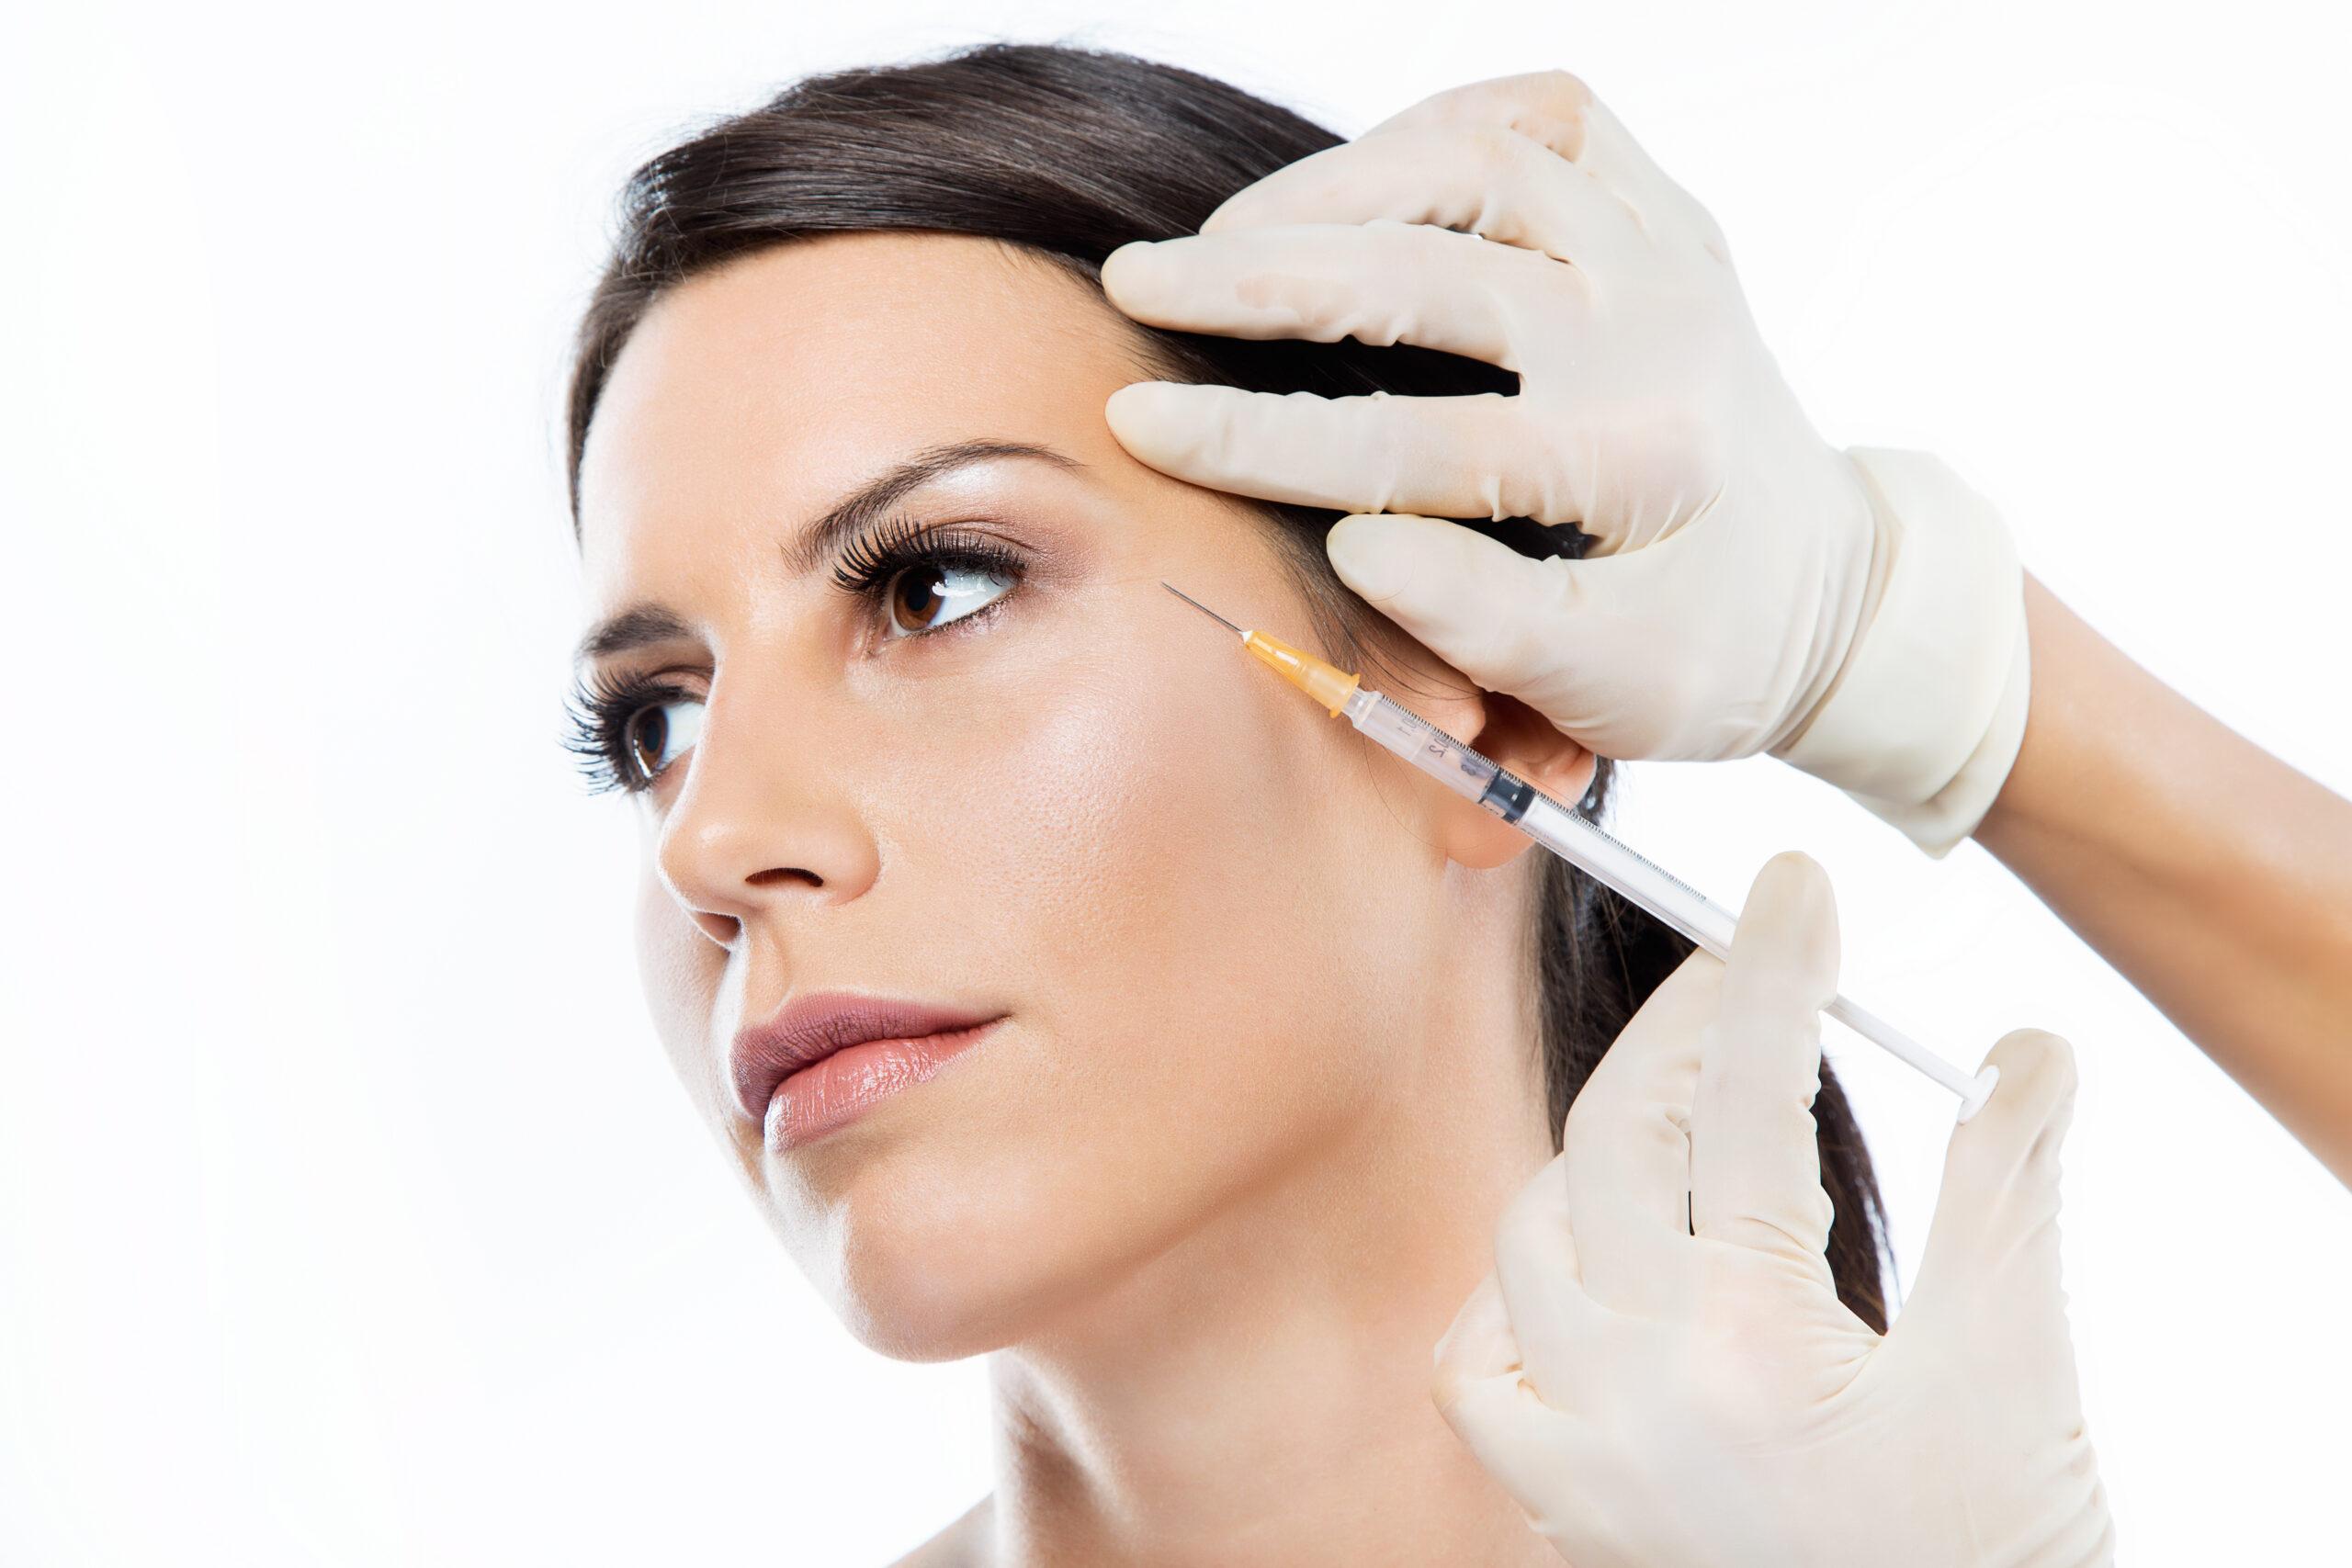 Medo do botox? Leia 10 mitos e verdades